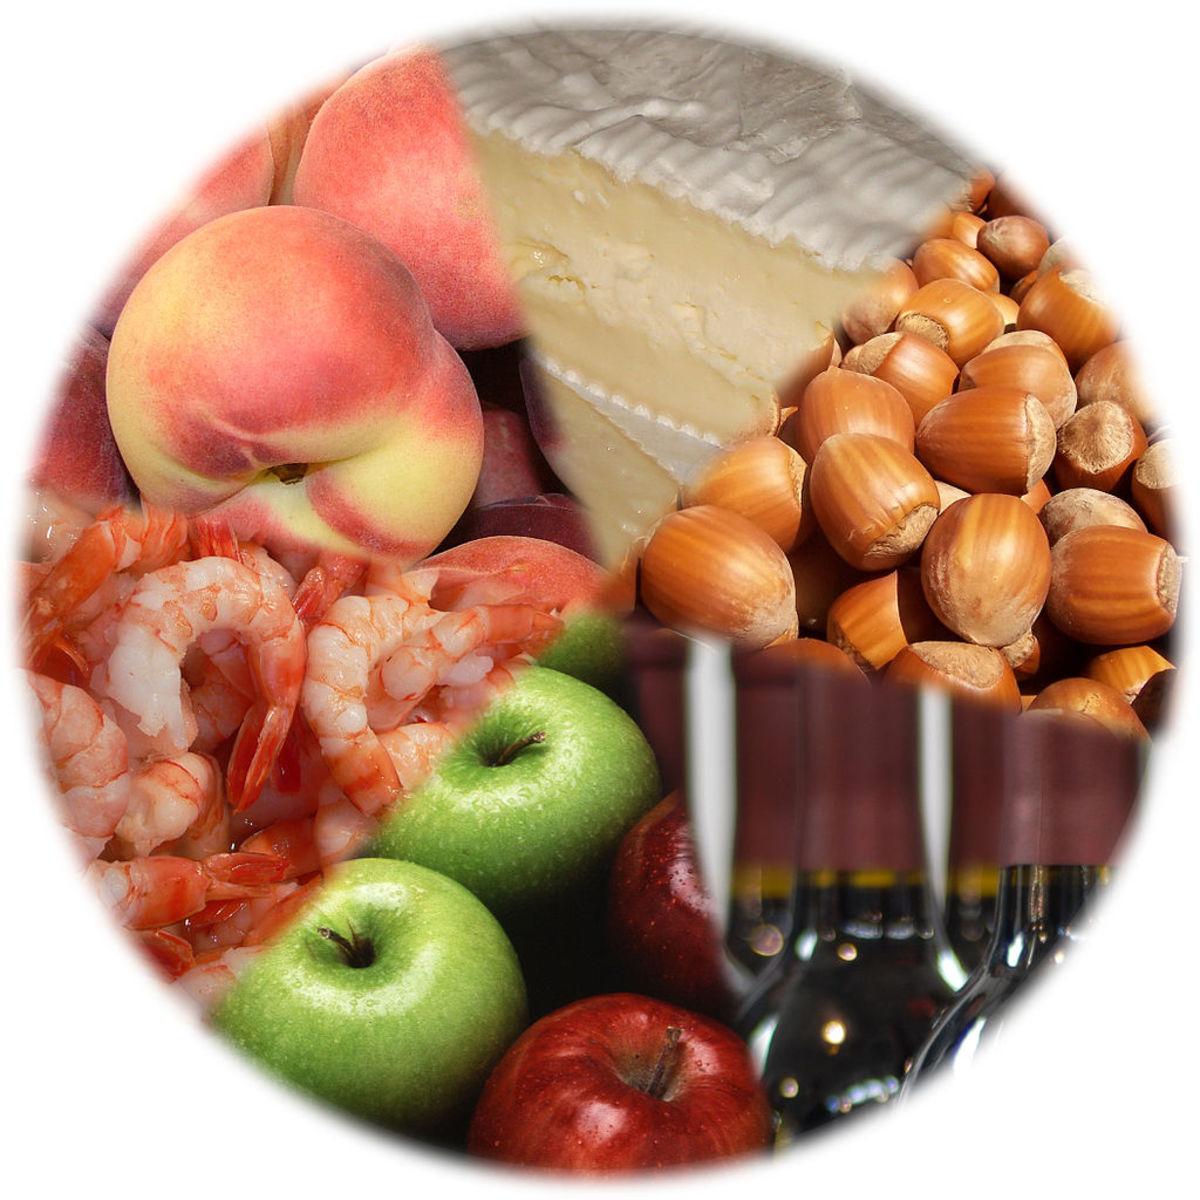 Food Allergies - Adult Onset Allergy | HubPages